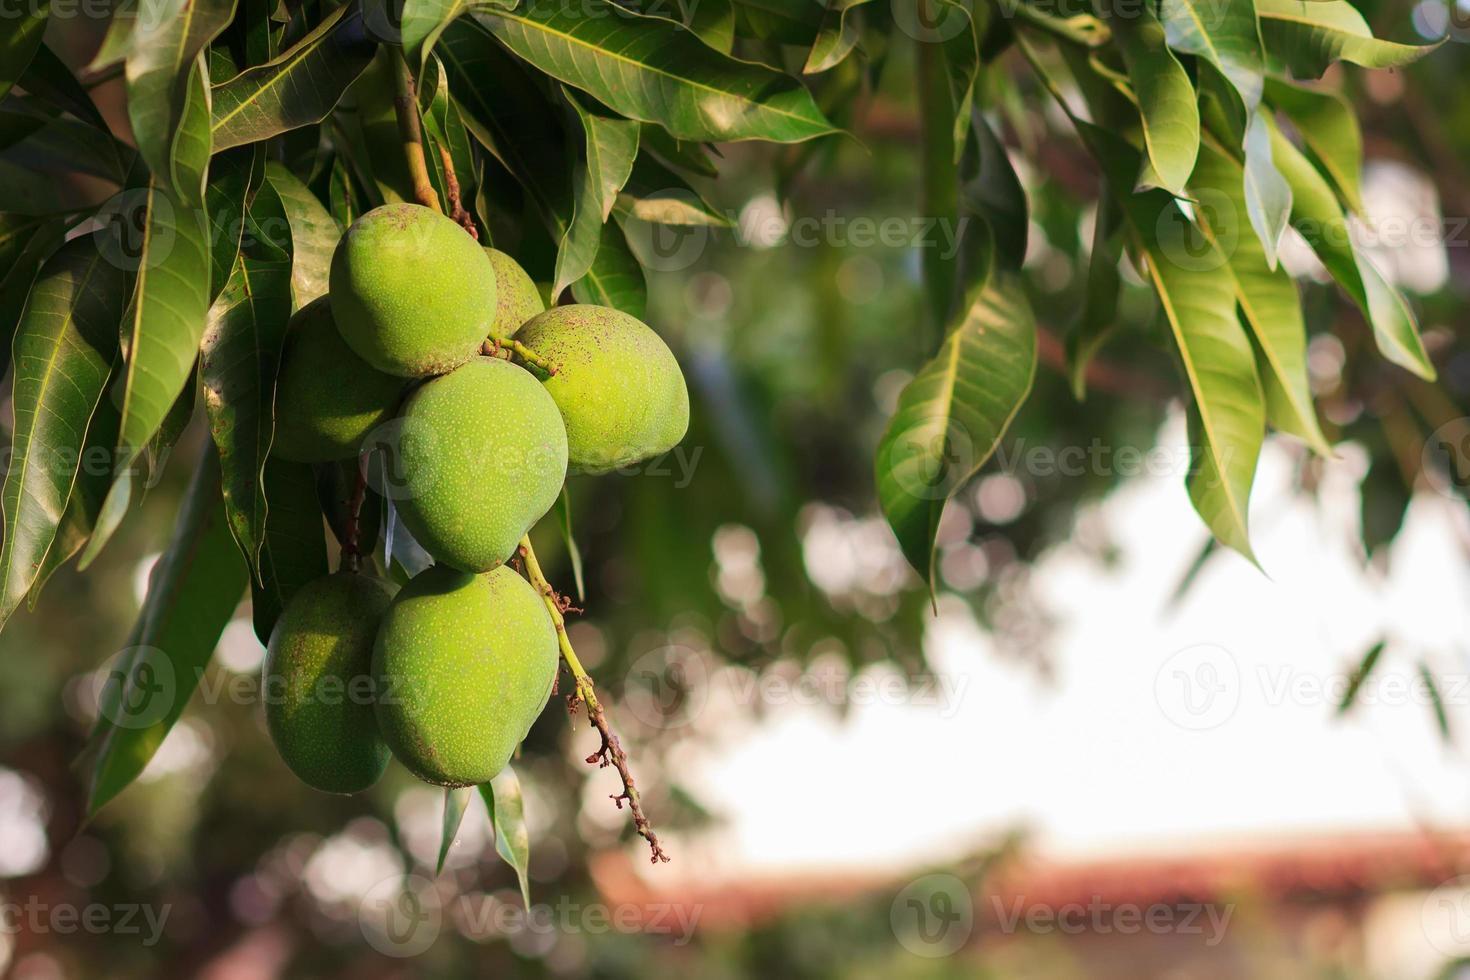 Bunch of green unripe mango on mango tree photo